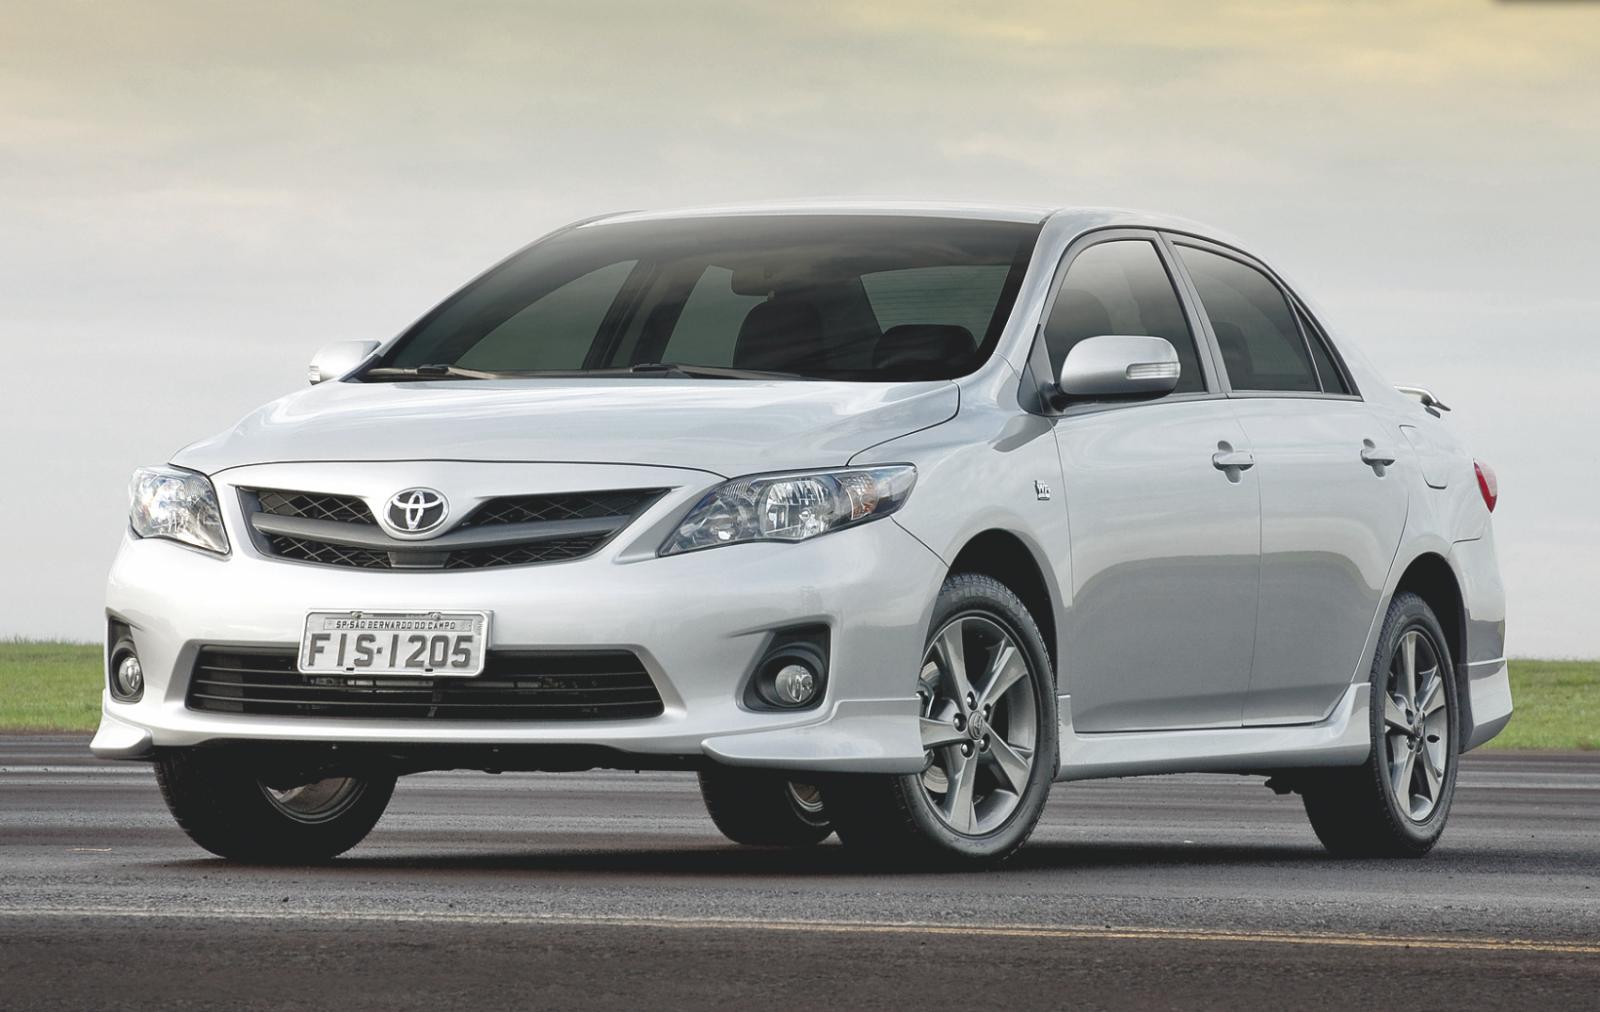 Toyota Corolla Xrs Sofre Recall Por Falha Em Airbag